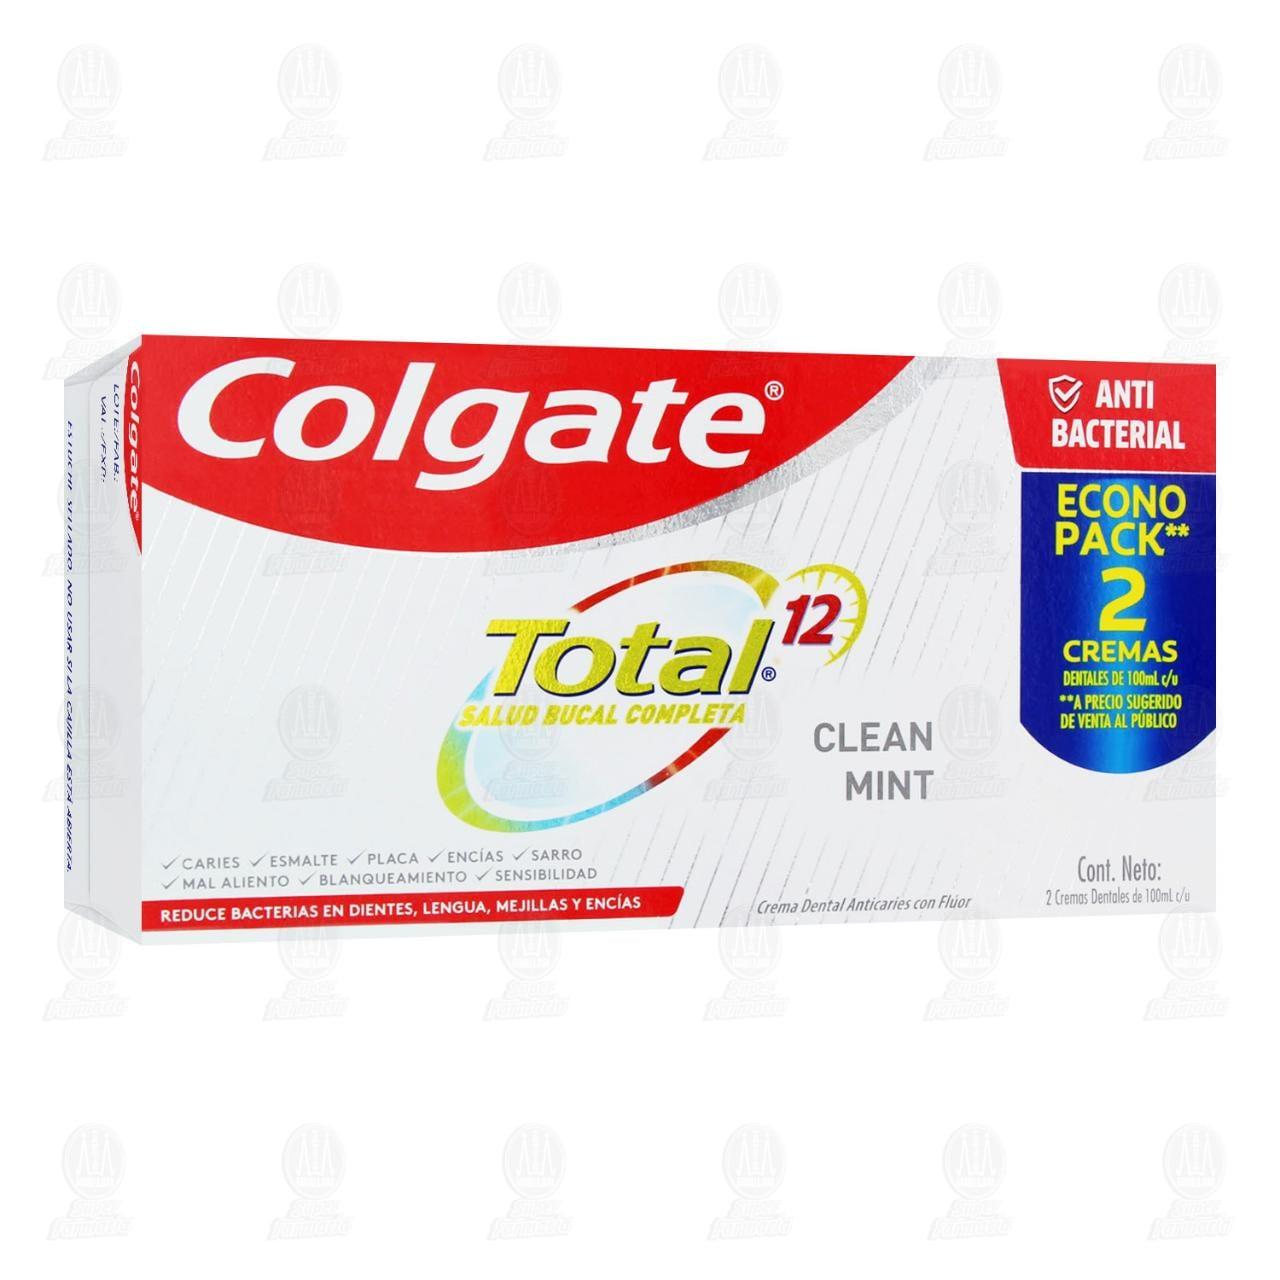 Comprar Pasta Dental Colgate Total 12 Clean Mint, 2 pzas 100 ml. en Farmacias Guadalajara